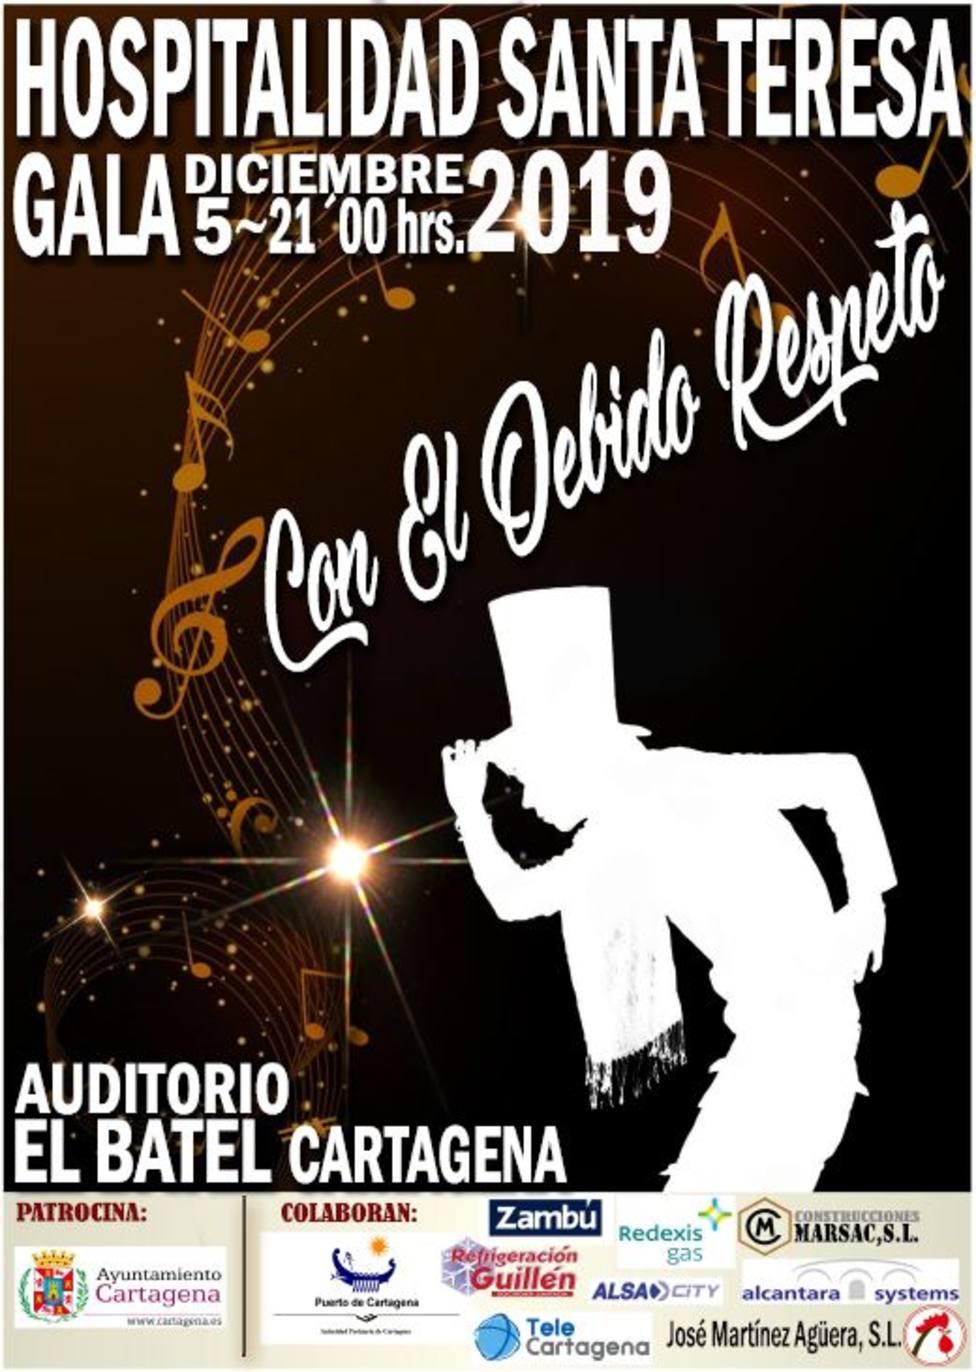 La Hospitalidad de Santa Teresa celebra su gala anual